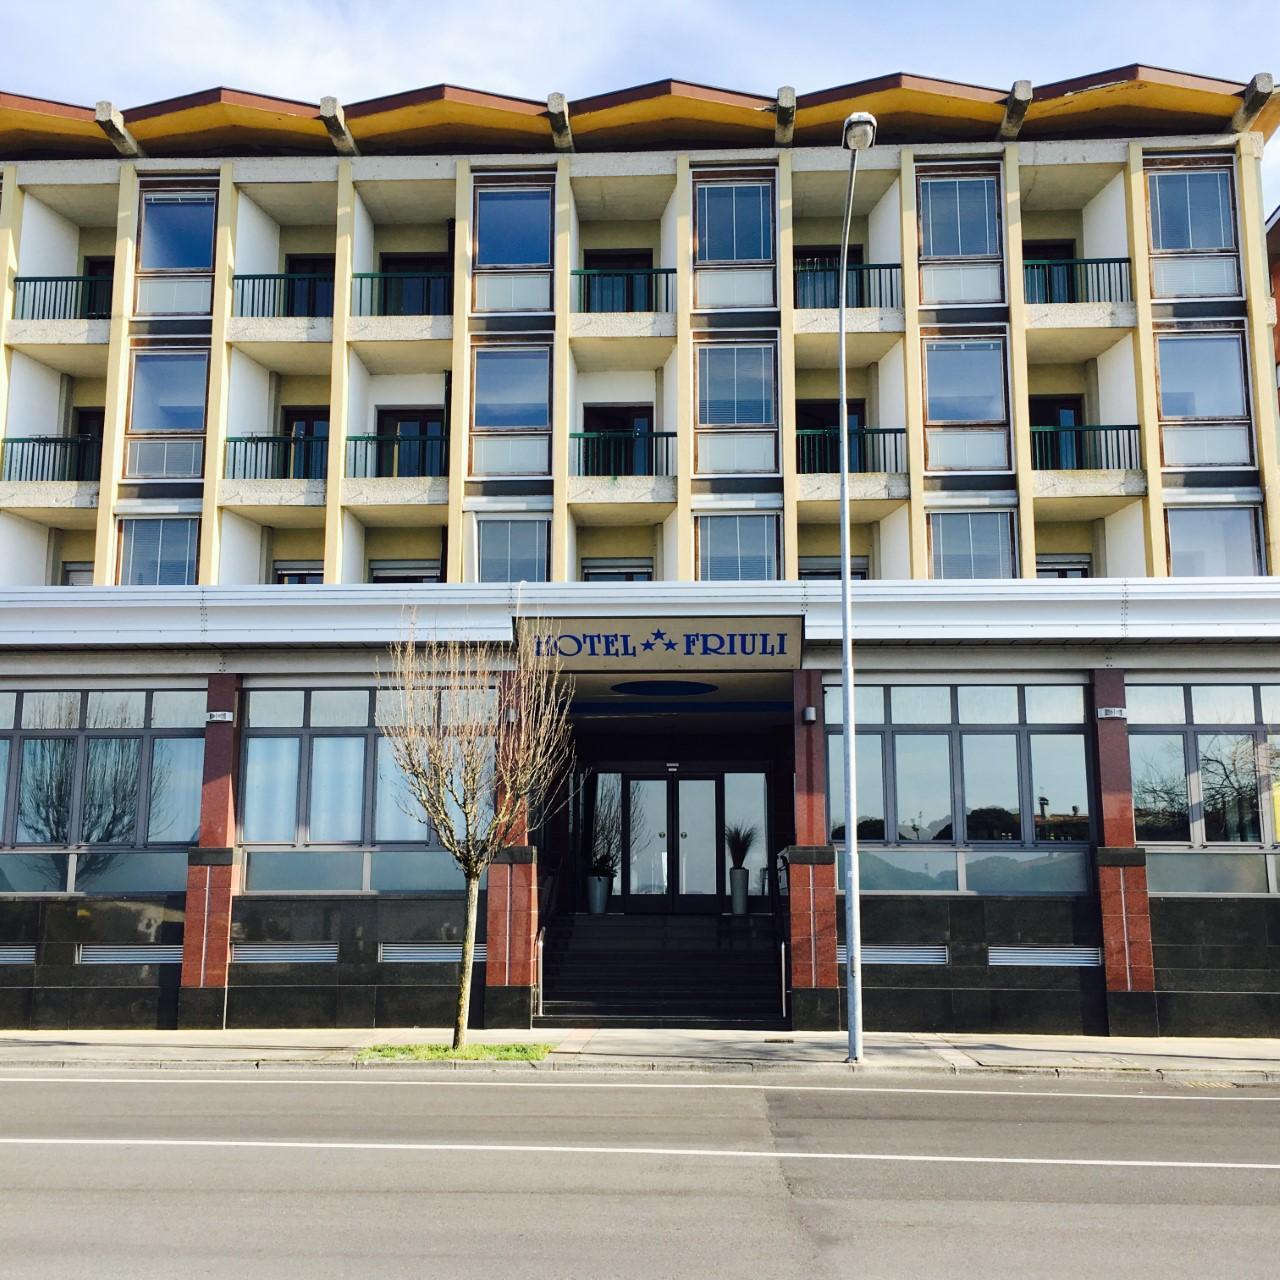 Hotel New Friuli